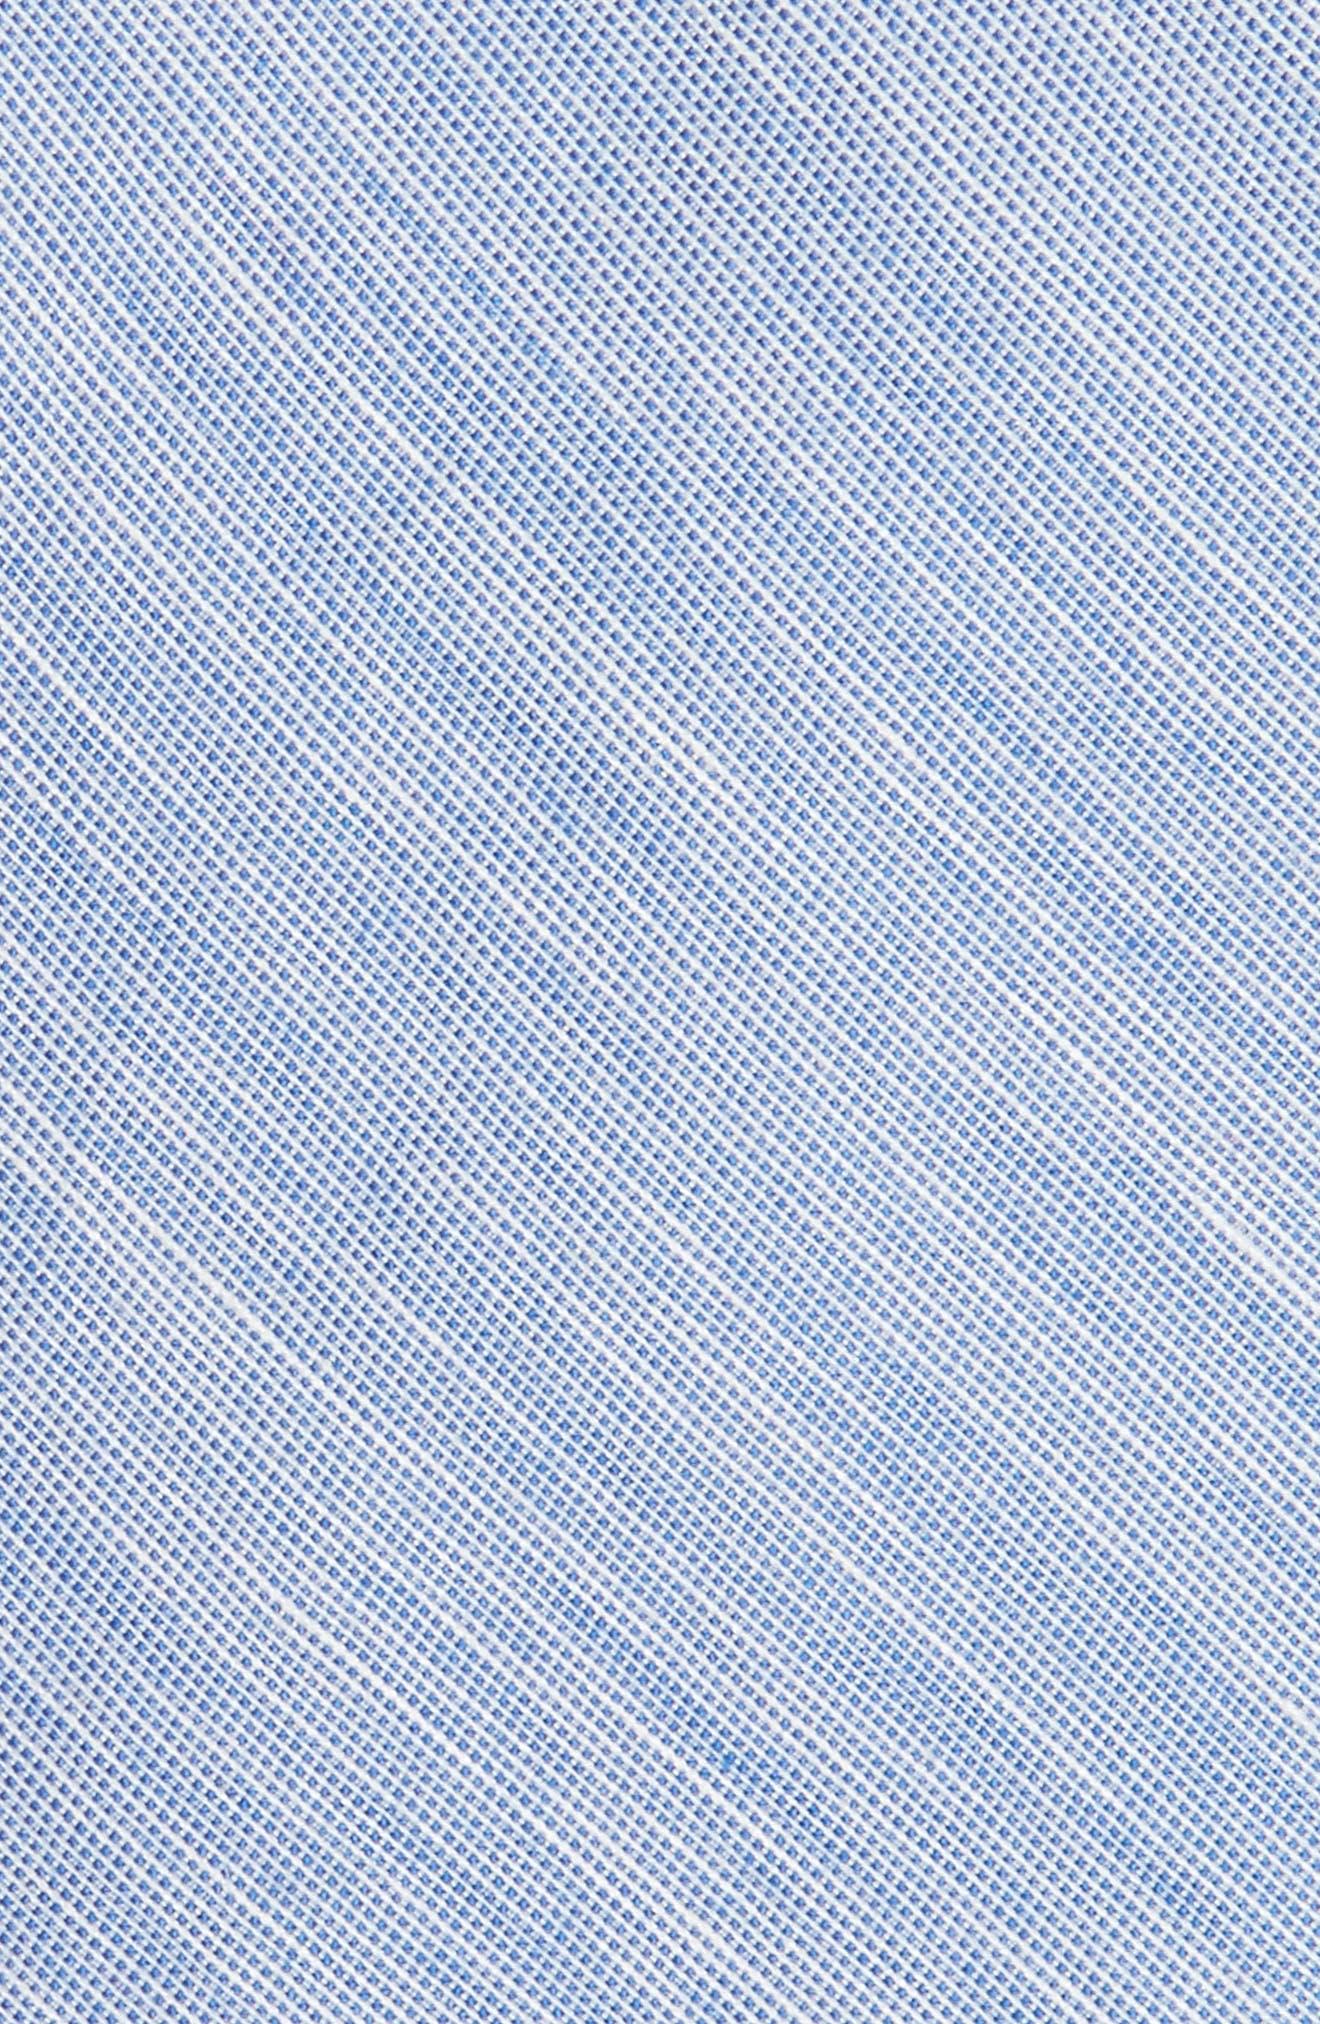 Adena Solid Silk Blend Skinny Tie,                             Alternate thumbnail 9, color,